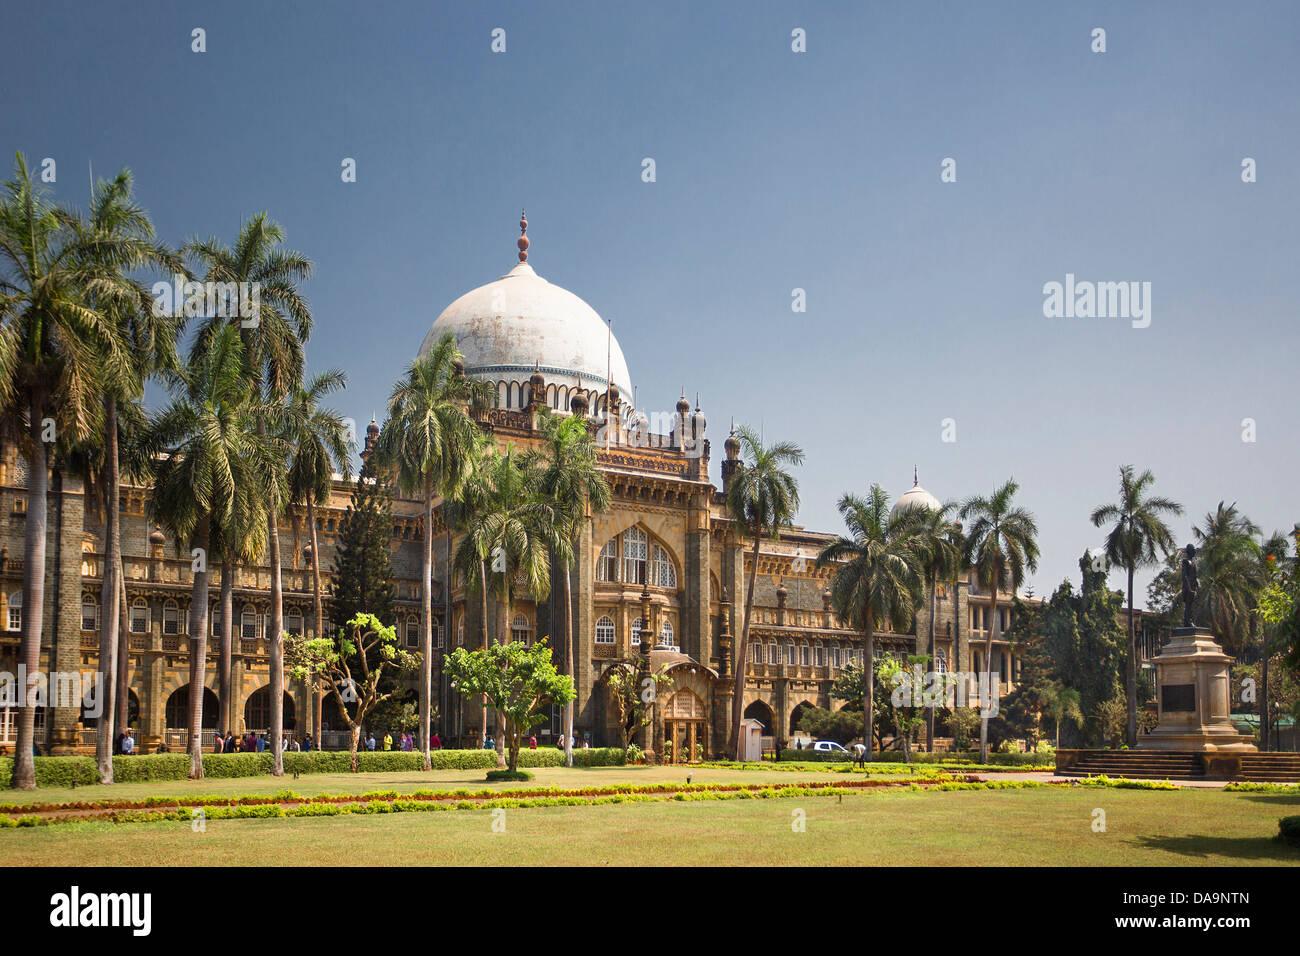 India India del Sud, Asia, Maharashtra, Mumbai Bombay, città di Prince of Wales Museum, Principe di Galles, Immagini Stock